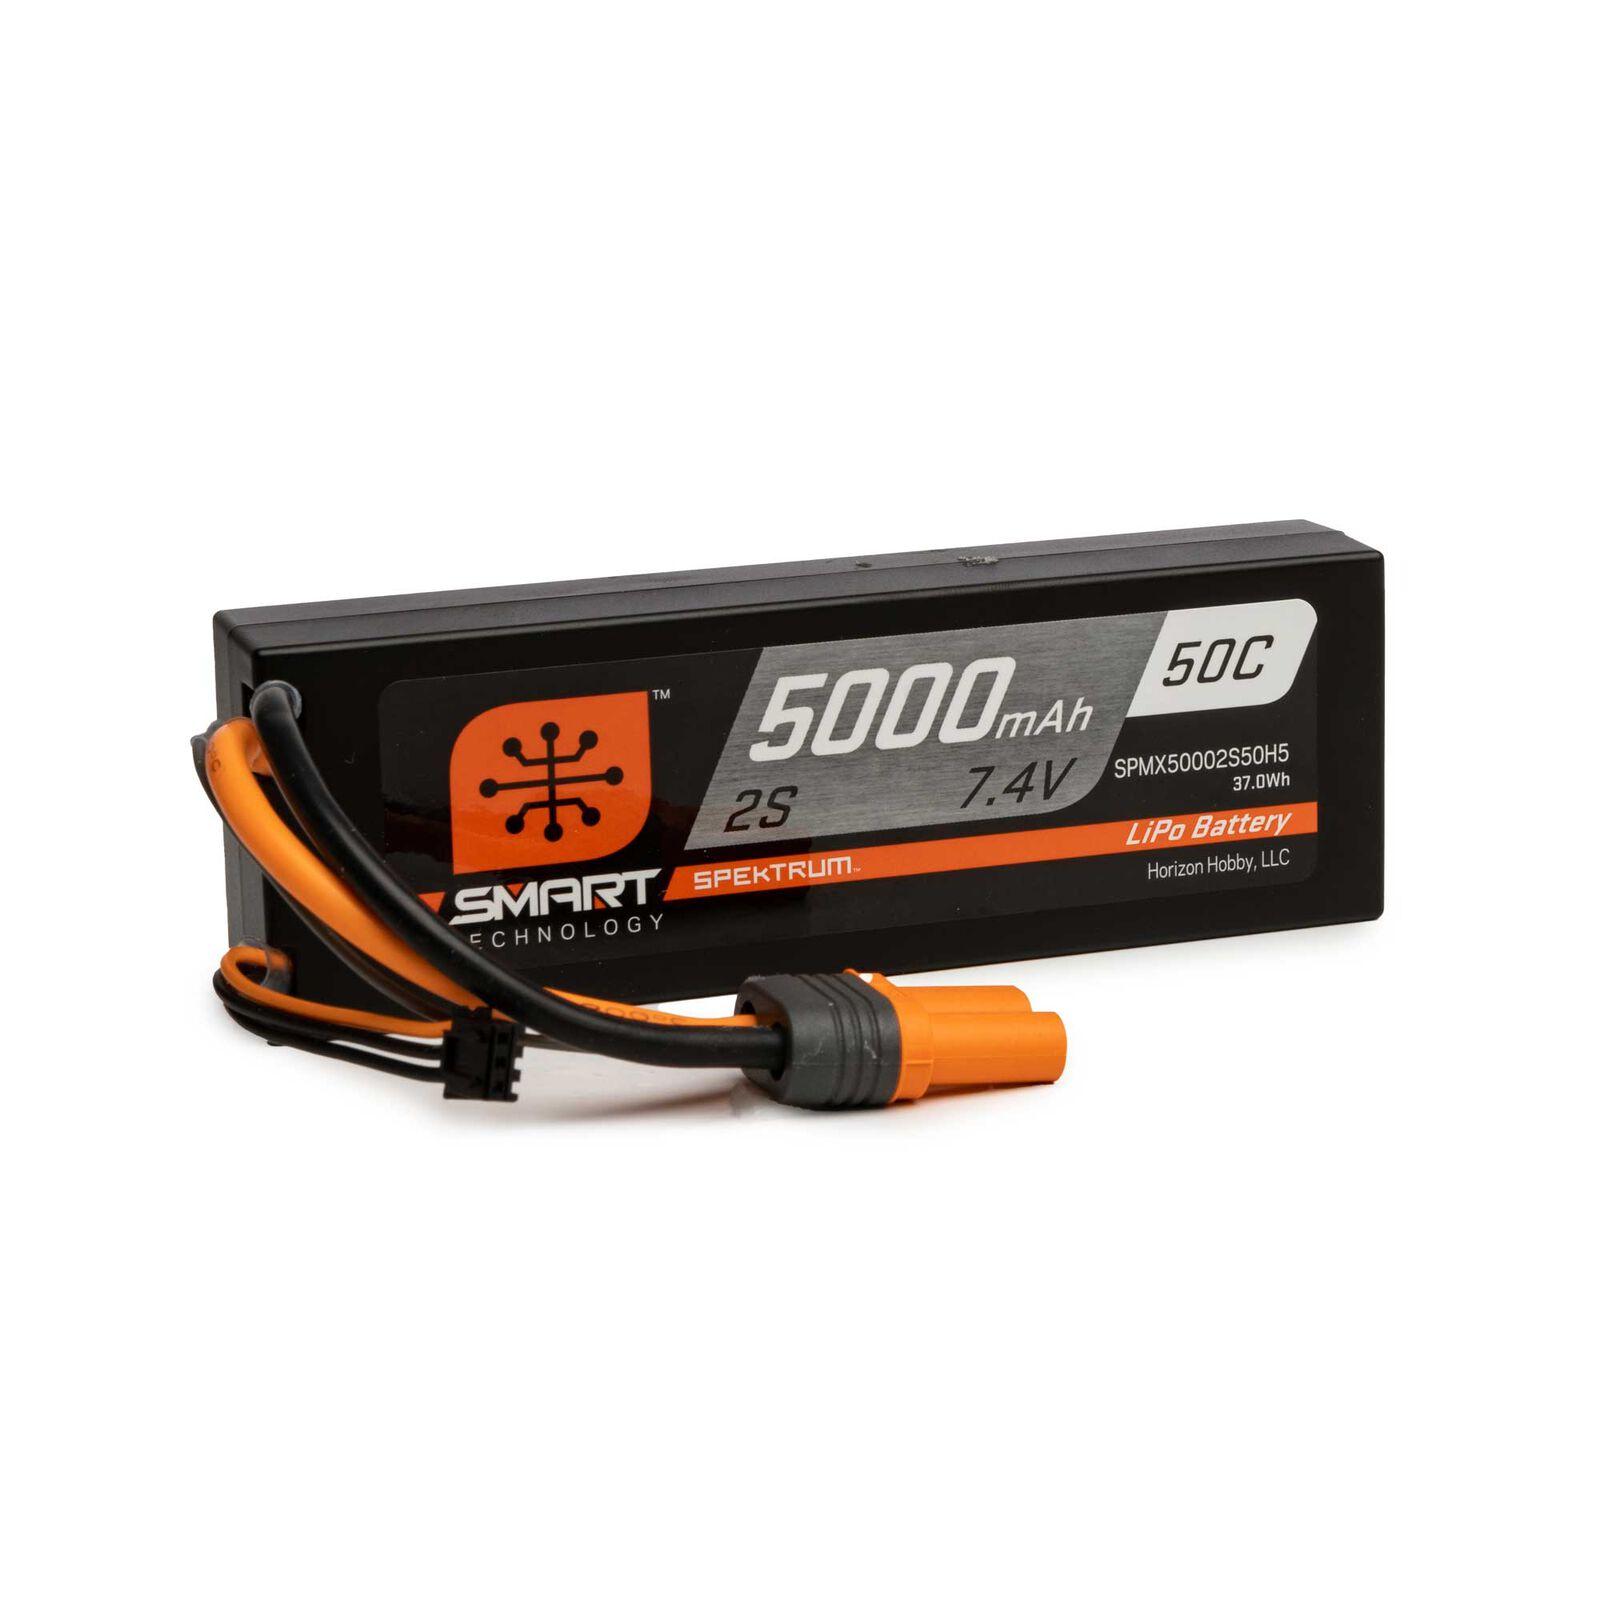 7.4V 5000mAh 2S 50C Smart Hardcase LiPo Battery: IC5